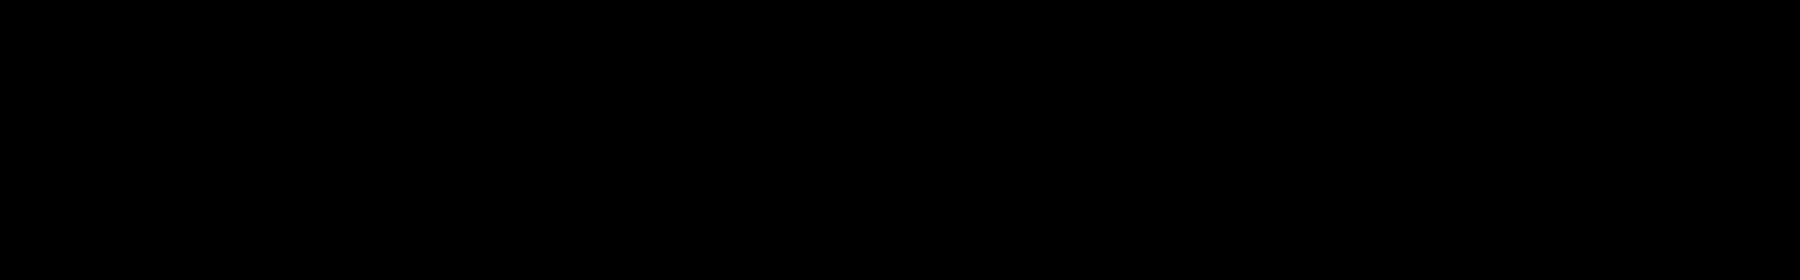 Poligon - Solee Style Ableton Live Template audio waveform